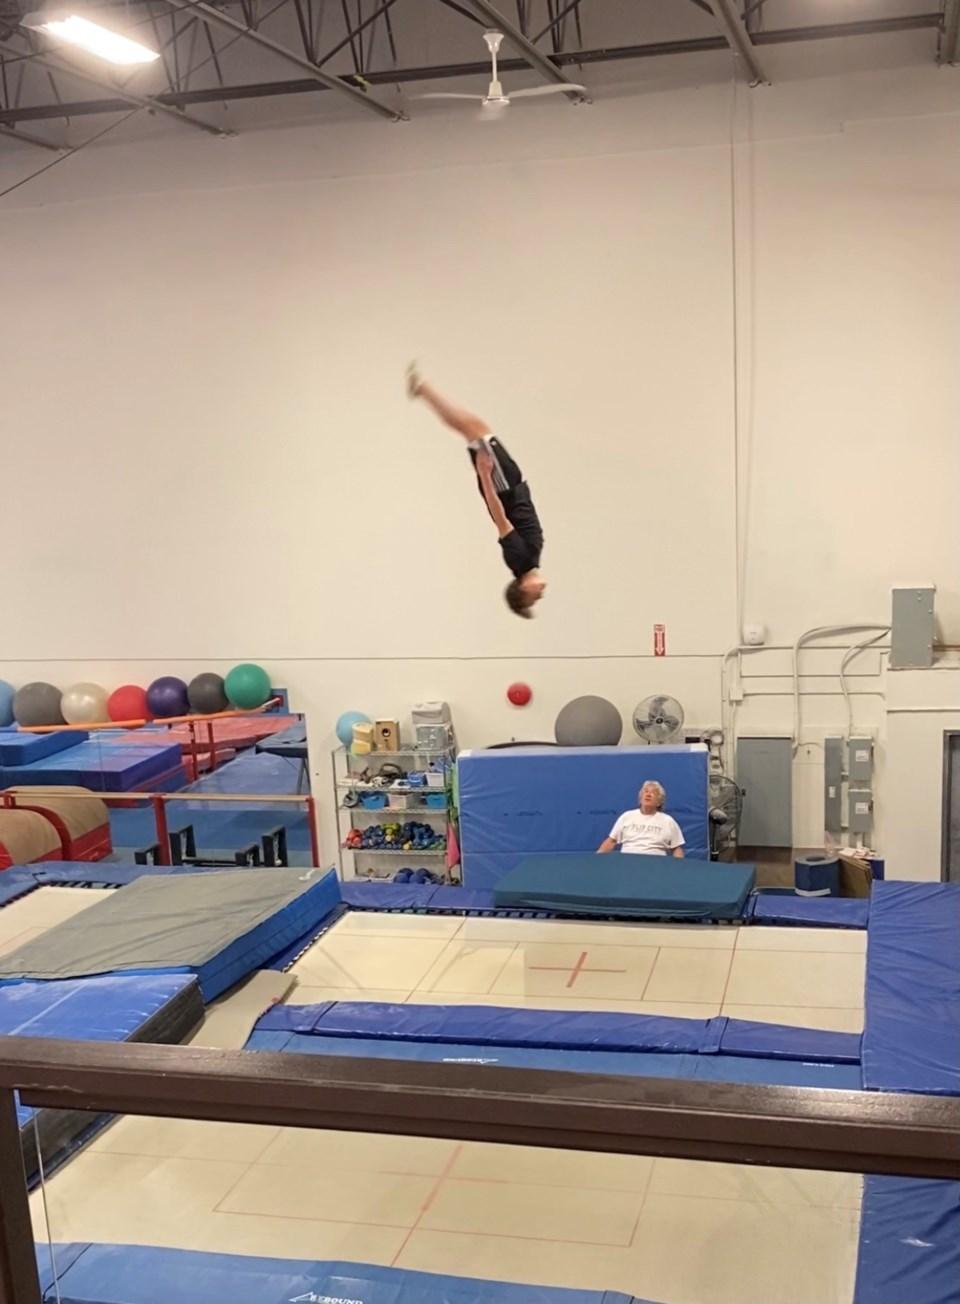 s-gymnastics- photo by Shannon Susko